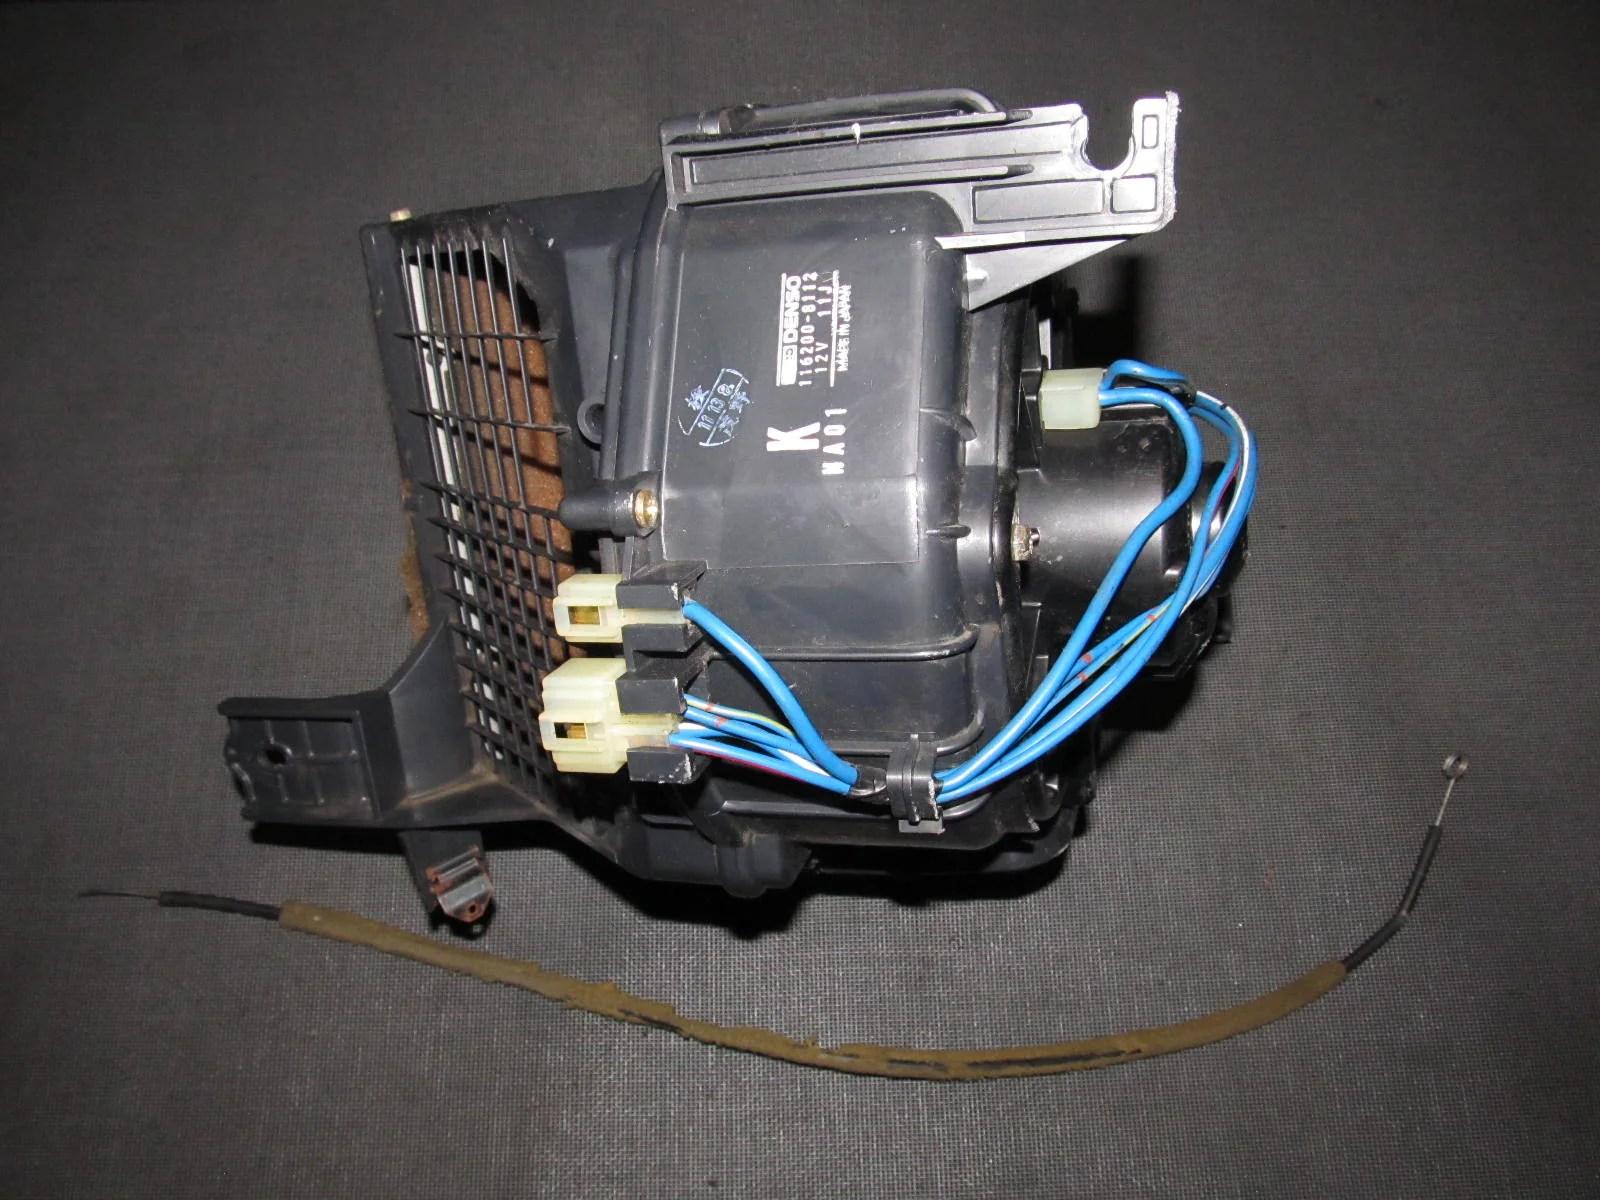 90 91 92 93 mazda miata oem a c heater blower motor unit [ 1600 x 1200 Pixel ]